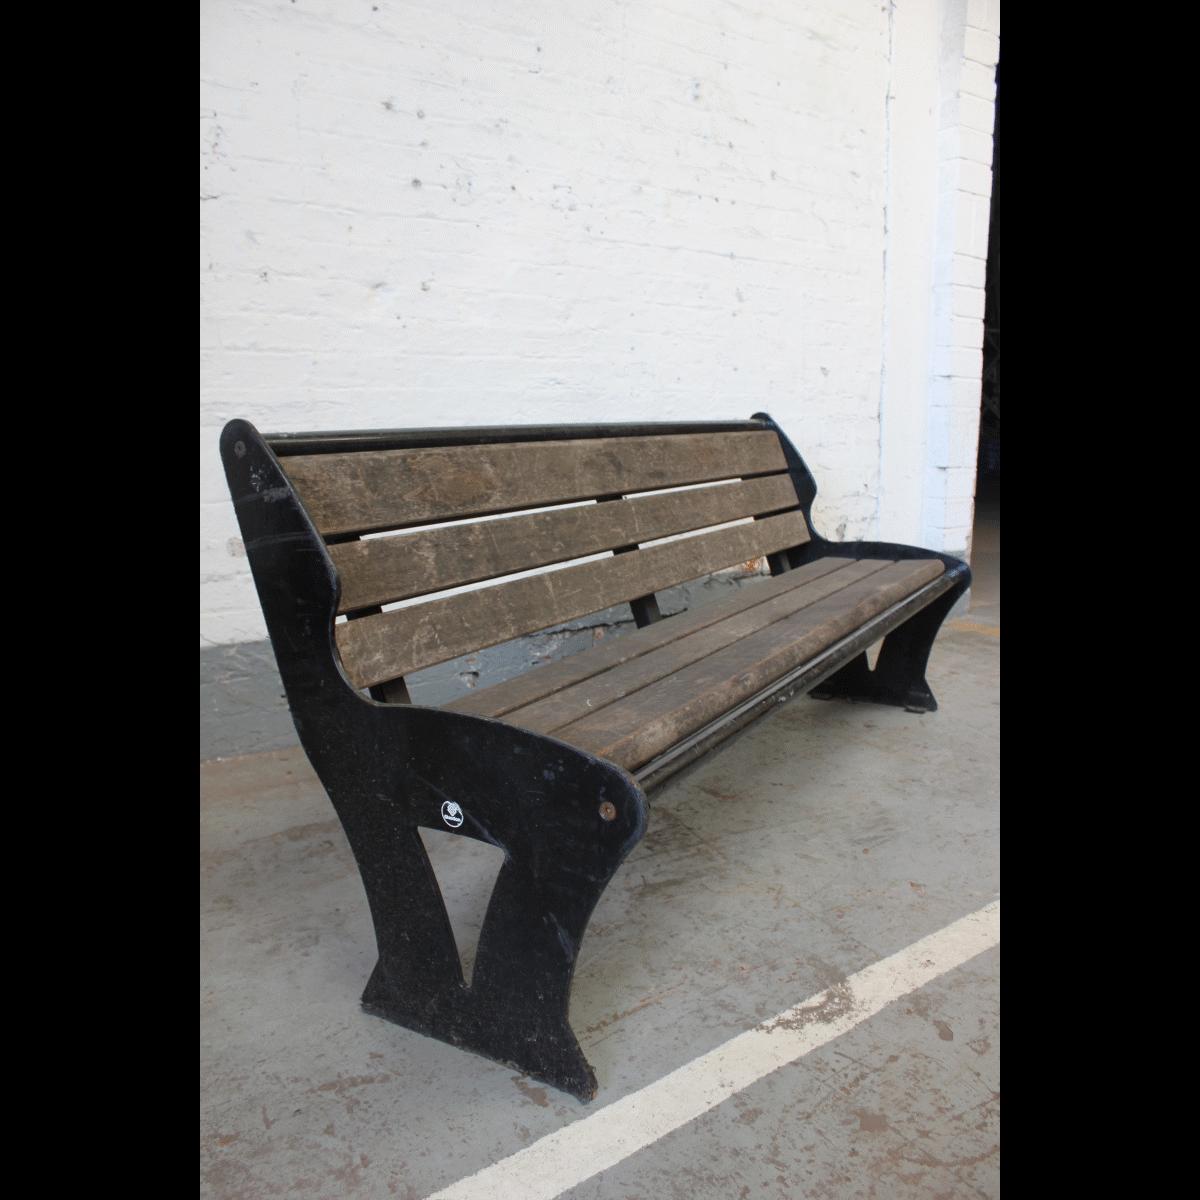 0012001 Wooden Park Bench X1 183wide 79 Height 46cm Deep Stockyard North